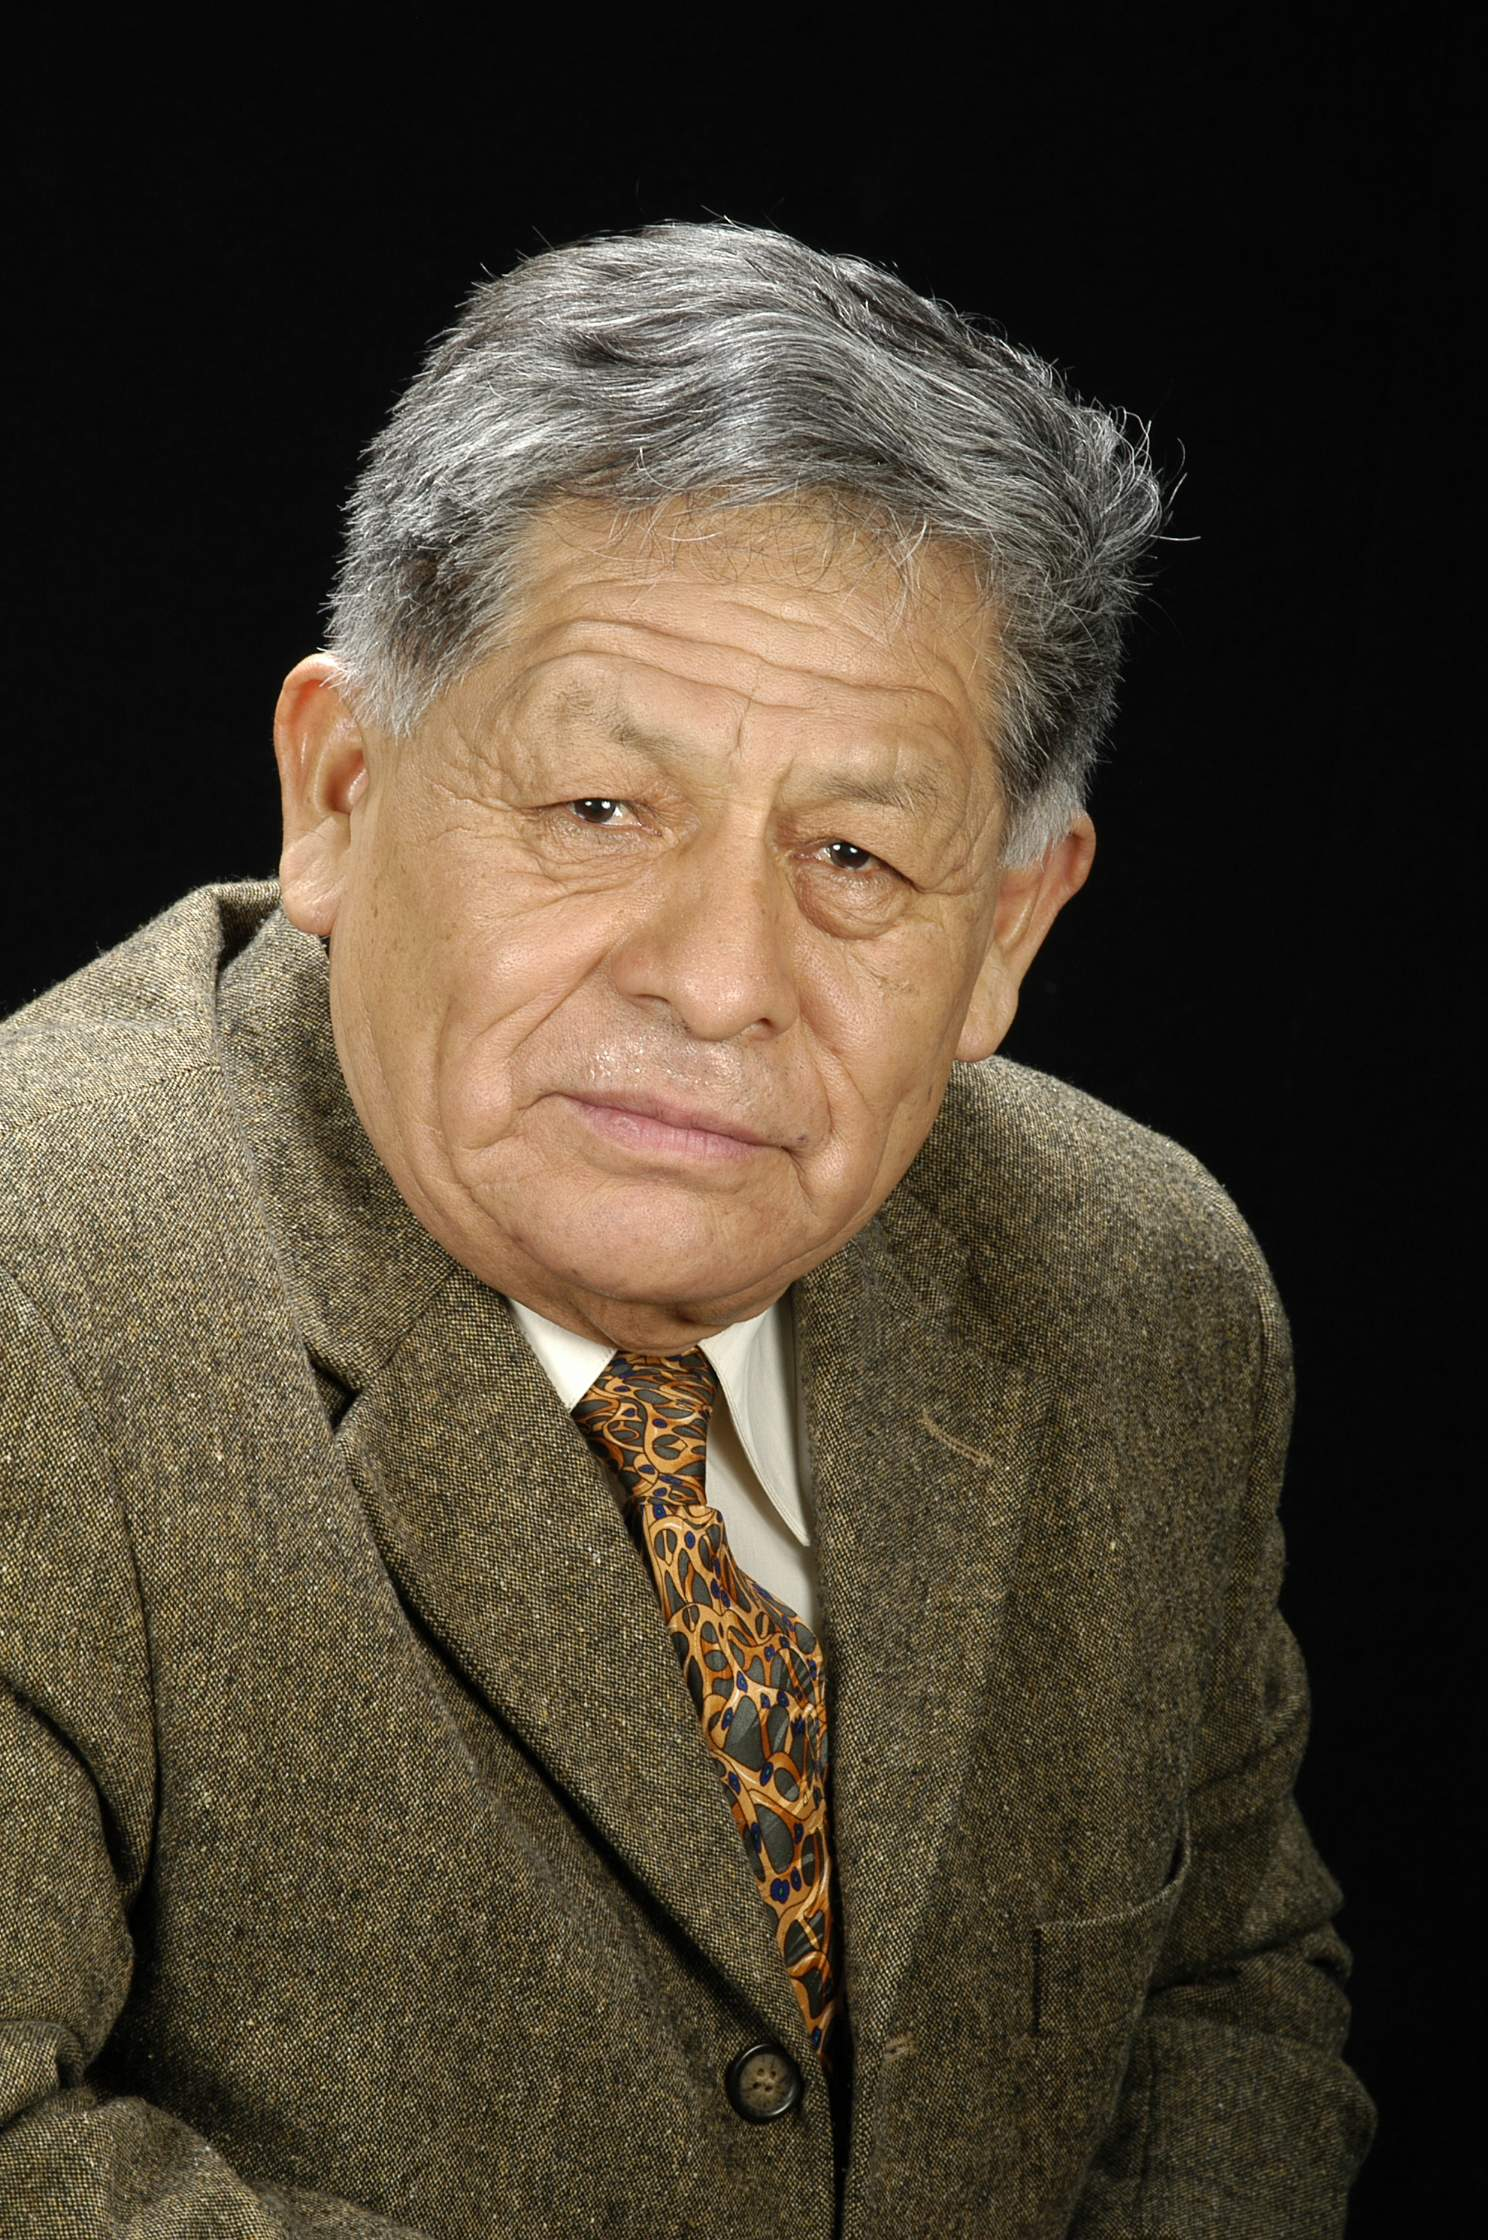 Dr. Mauro Sinche Yupanqui